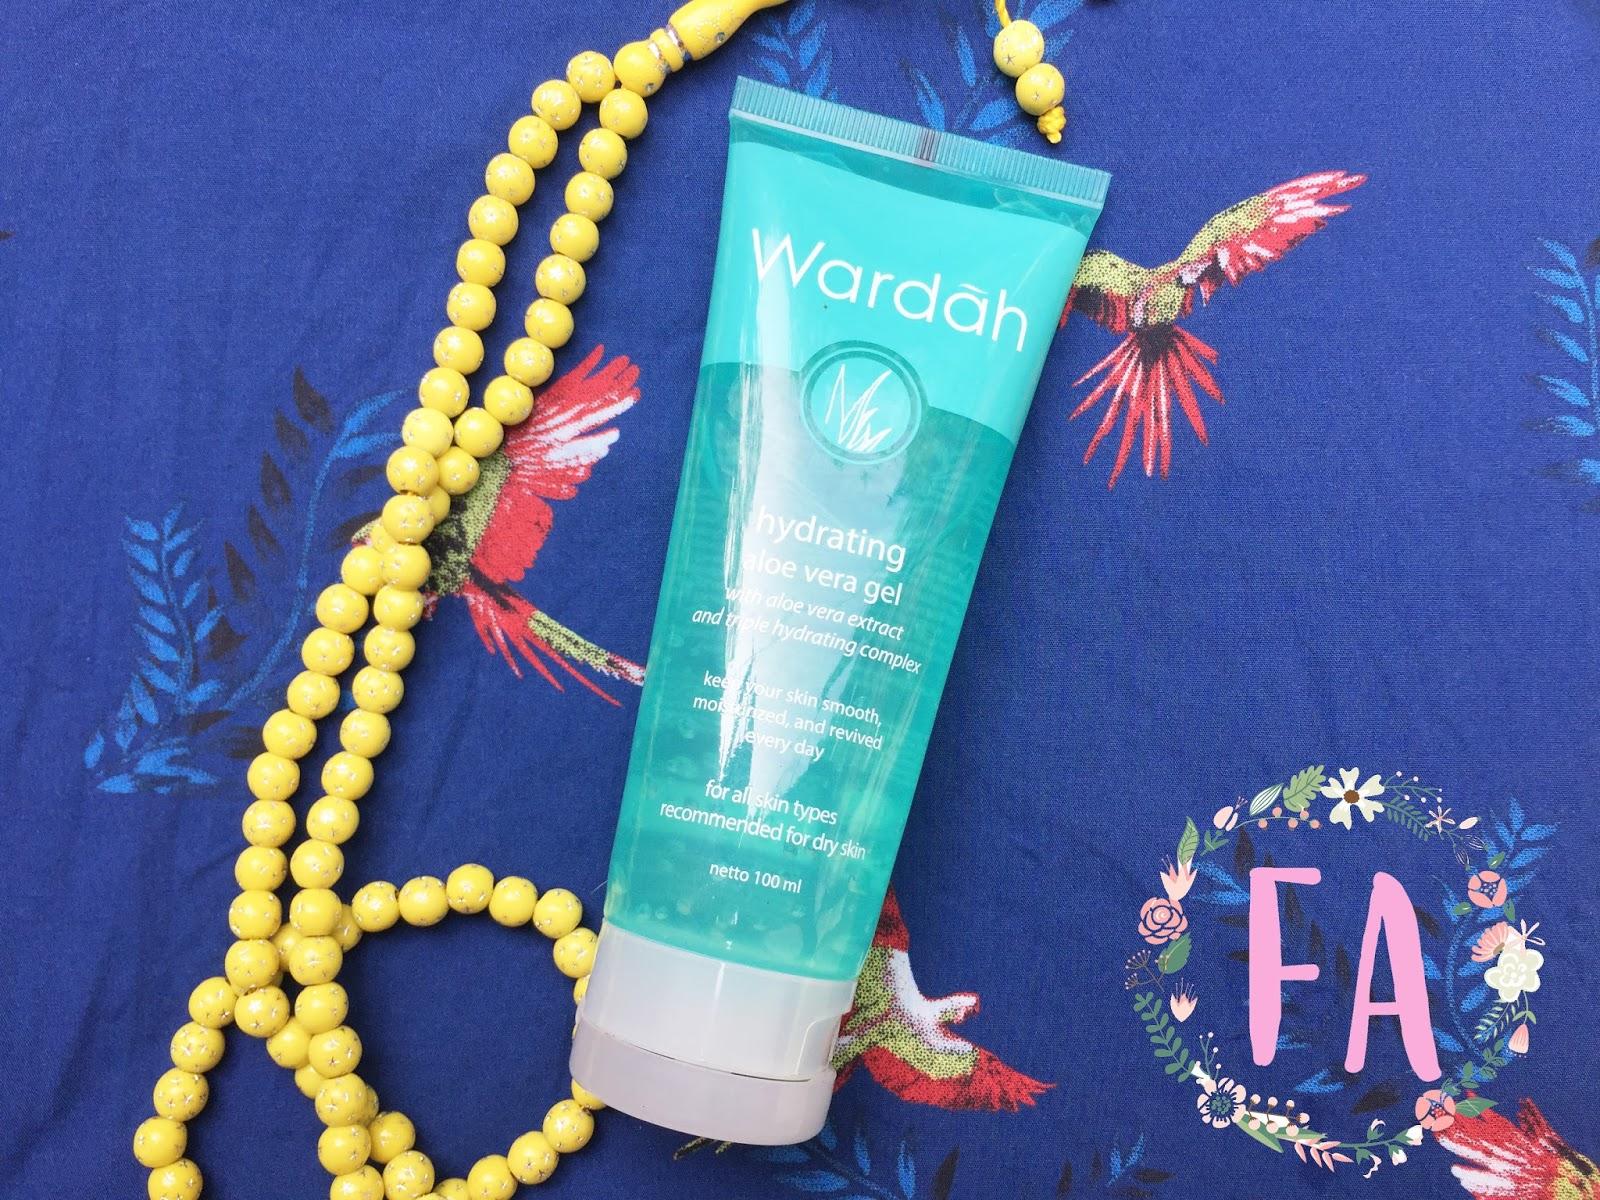 Wardah Hydrating Aloe Vera Gel Review